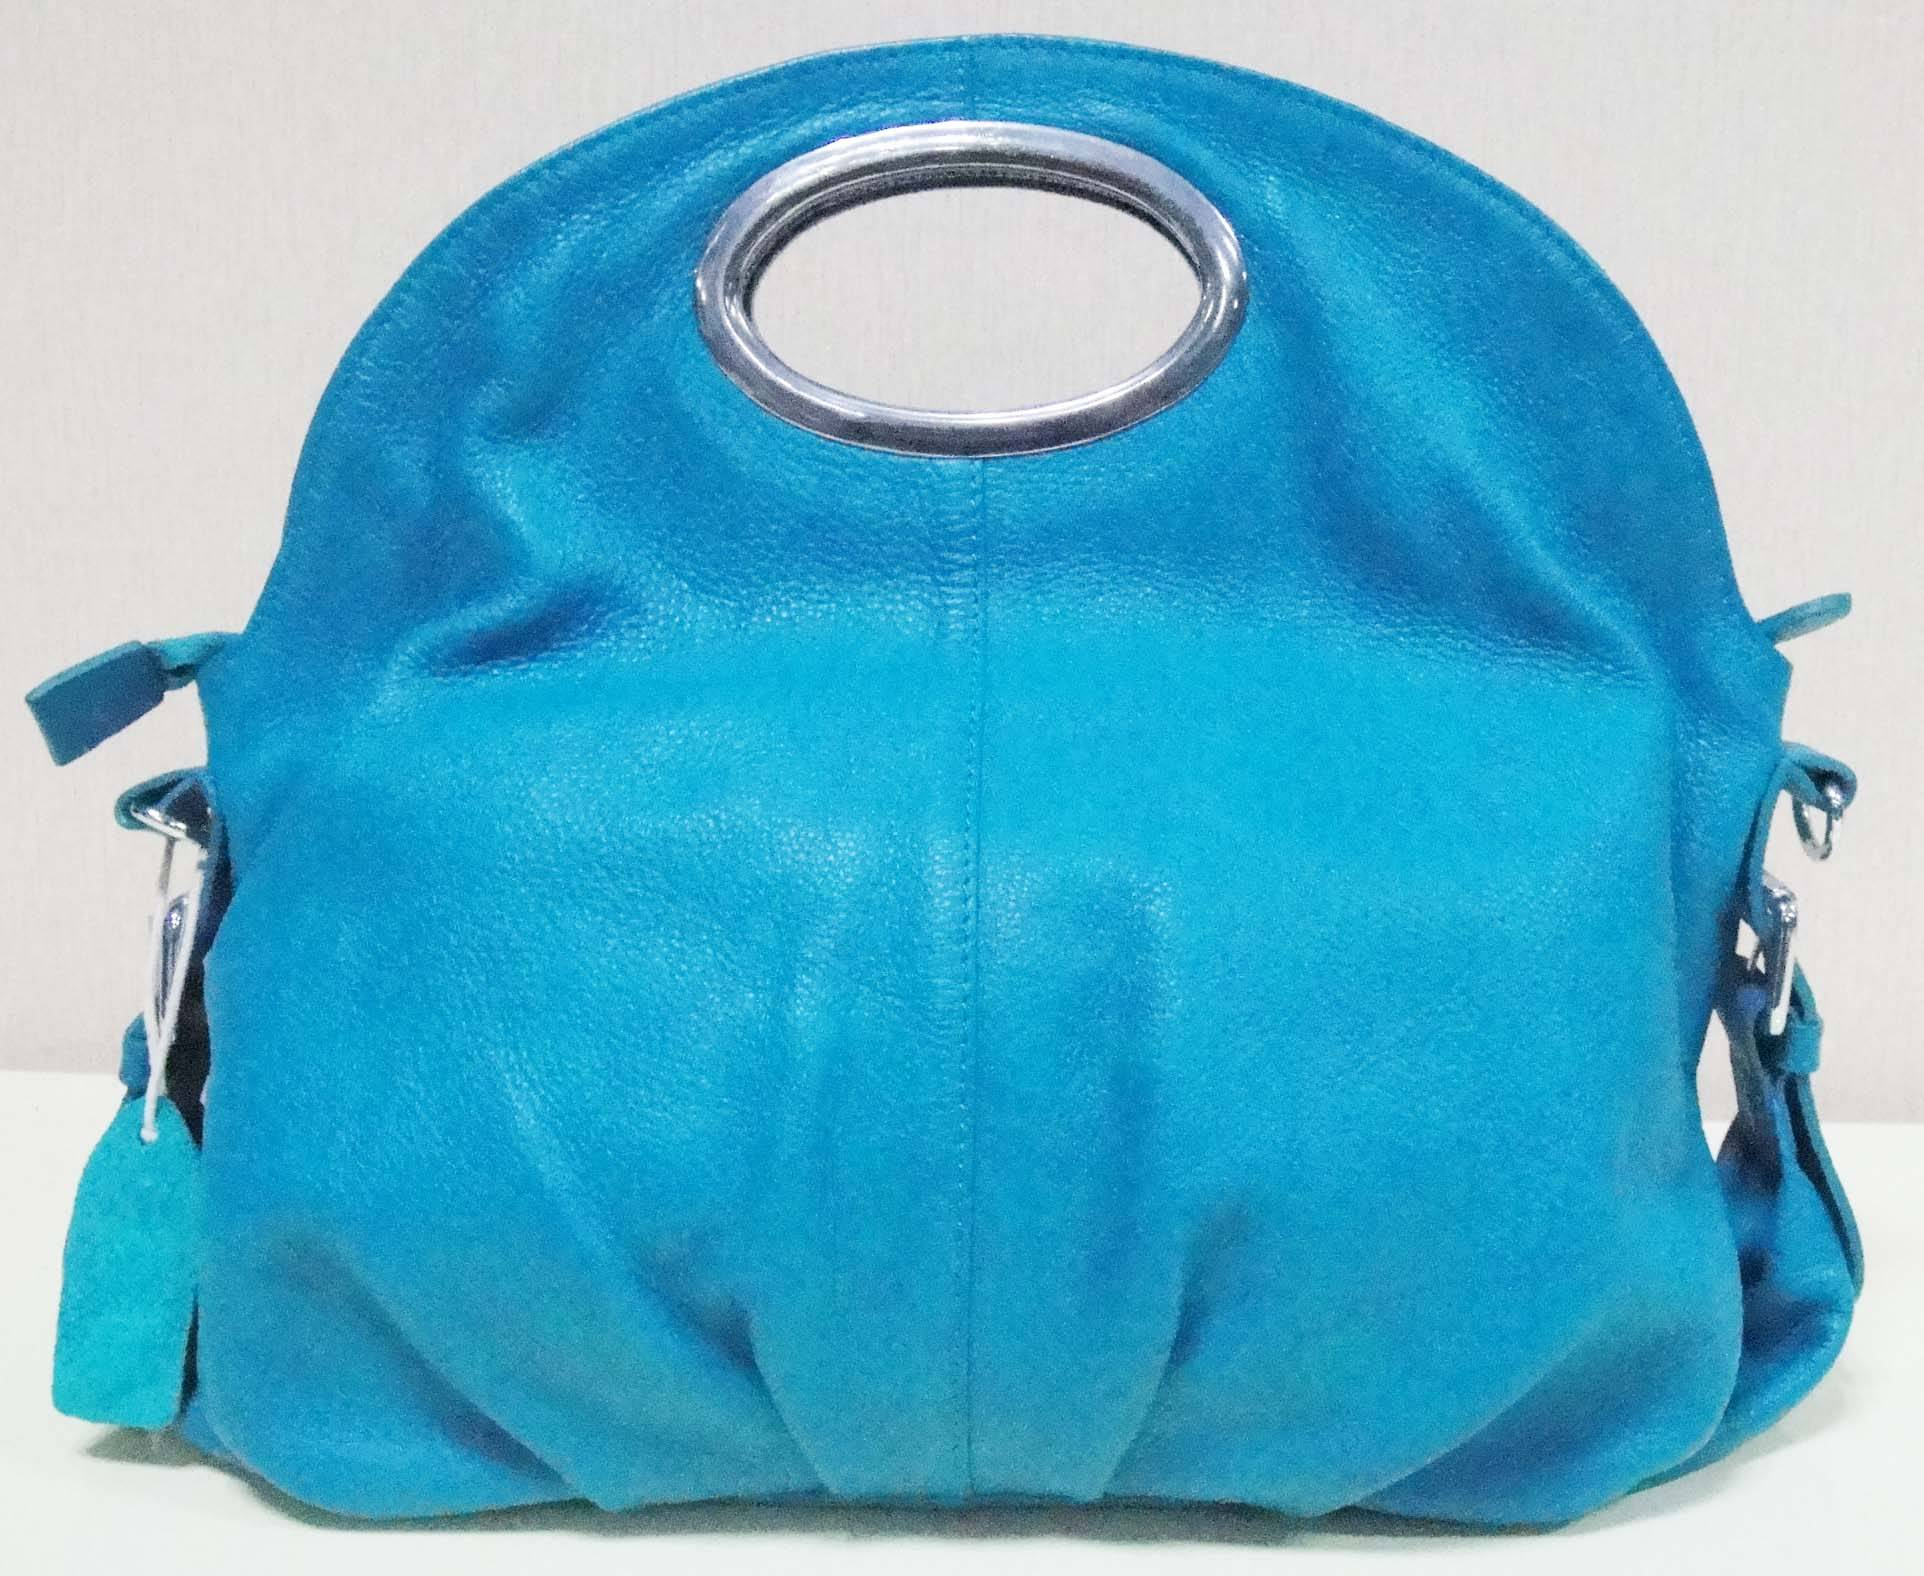 Naw arrival leisure leather handbag